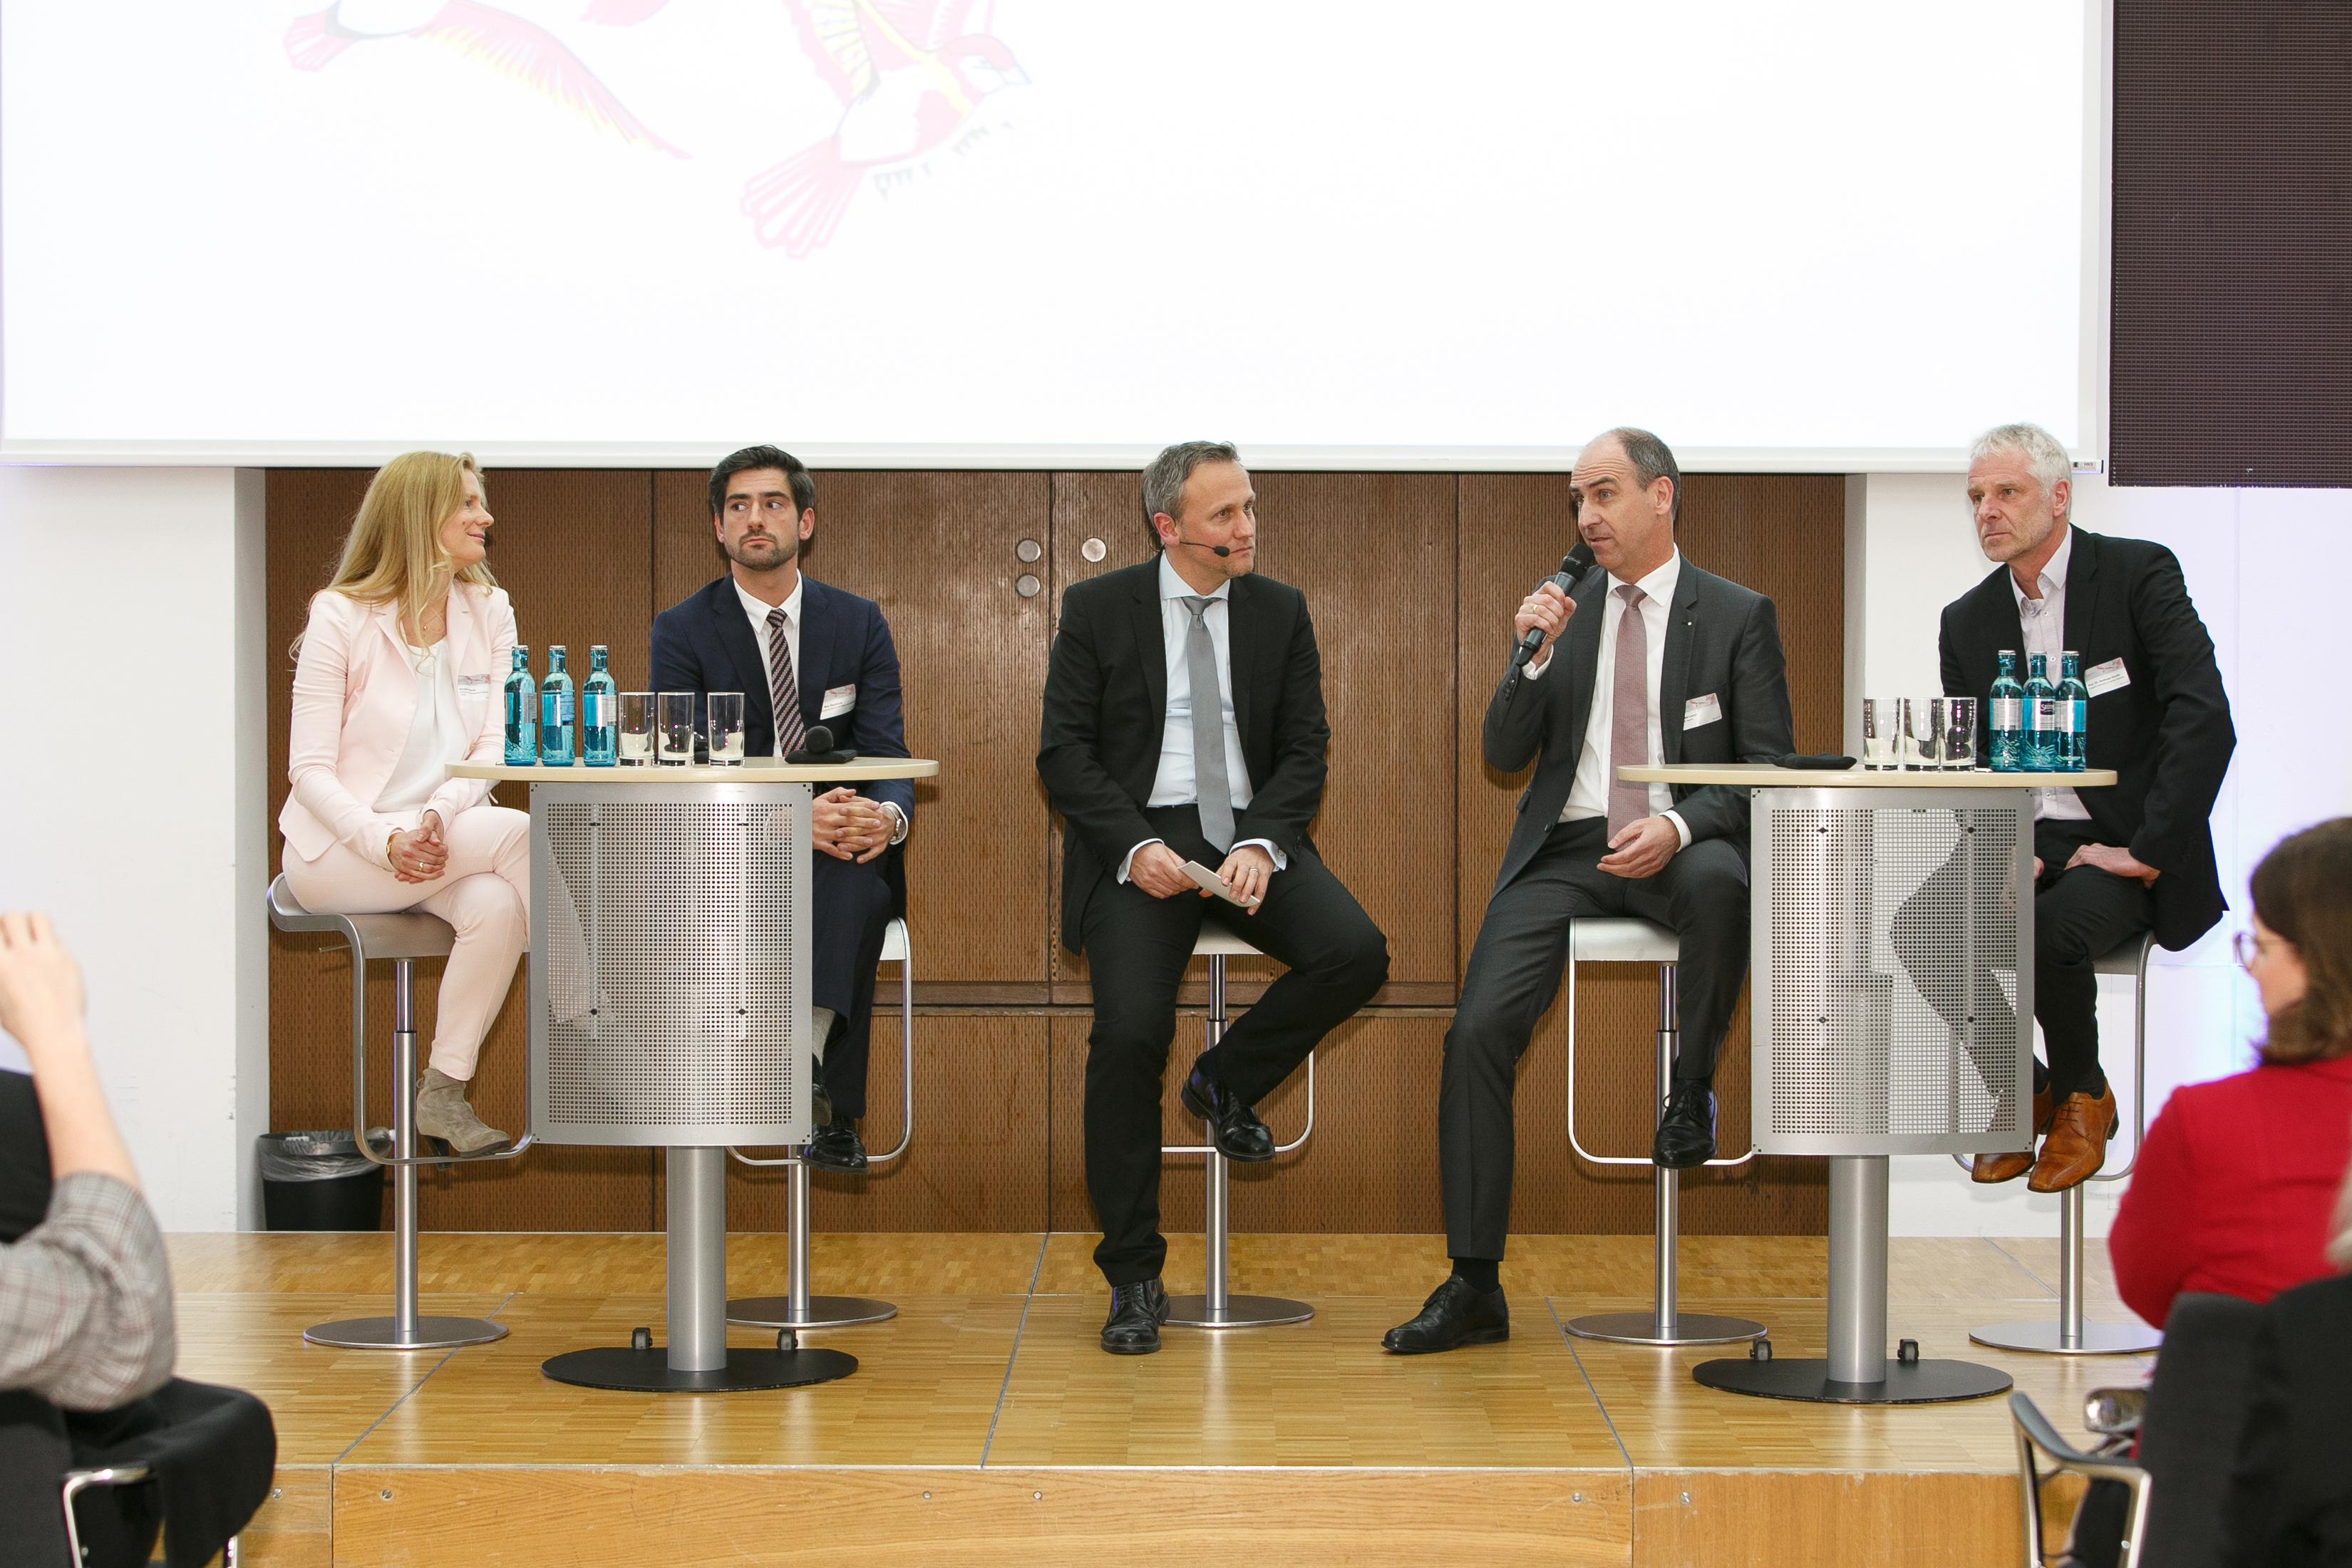 Talkrunde mit Annette Pascoe, Dr. Max Neufein, Sven Altheimer, Detlef Lamm, Prof. Dr. Andreas Klocke